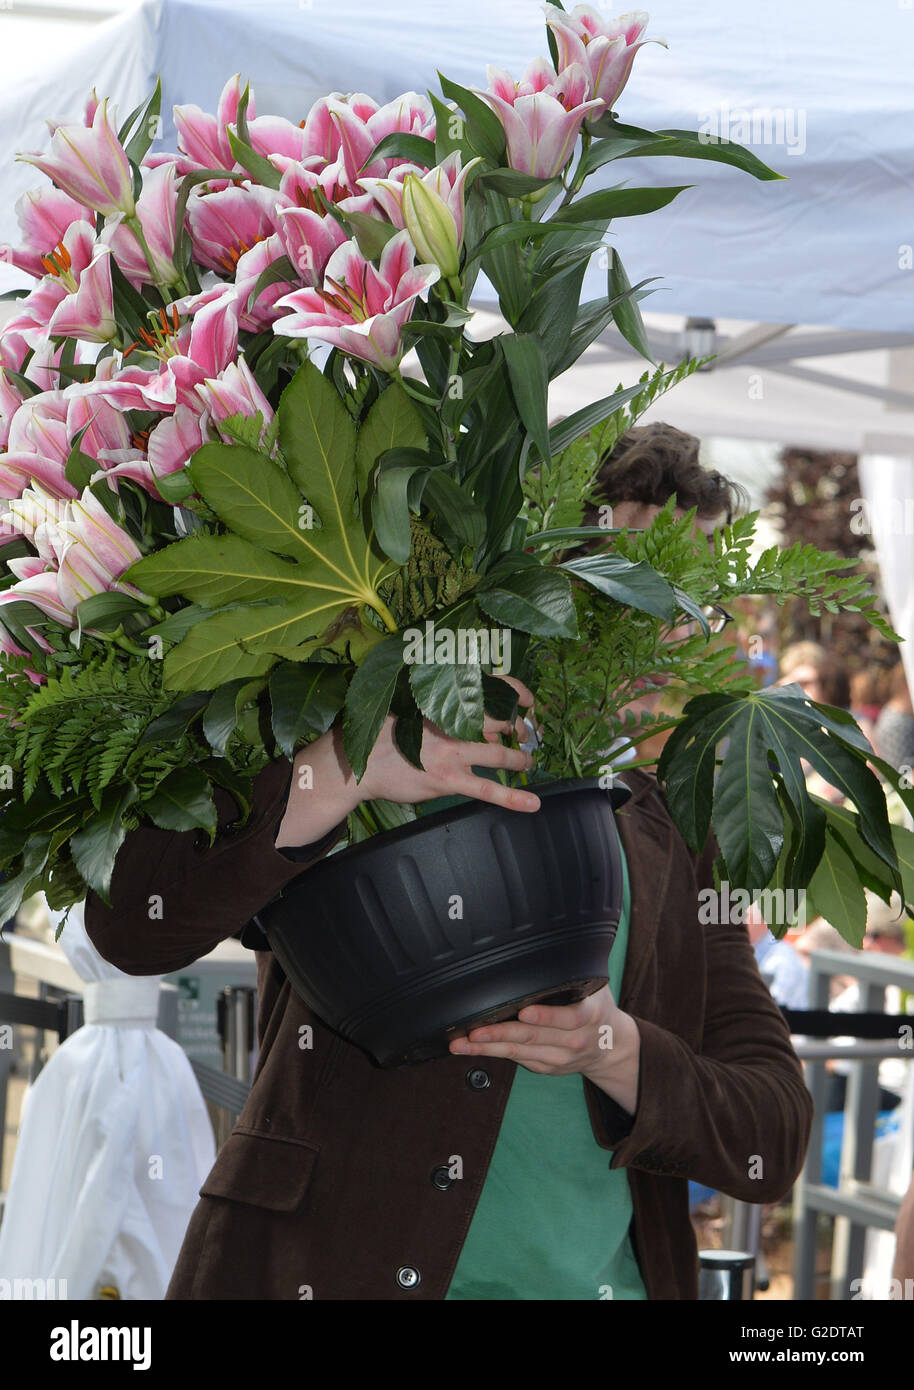 Chelsea flower show last day